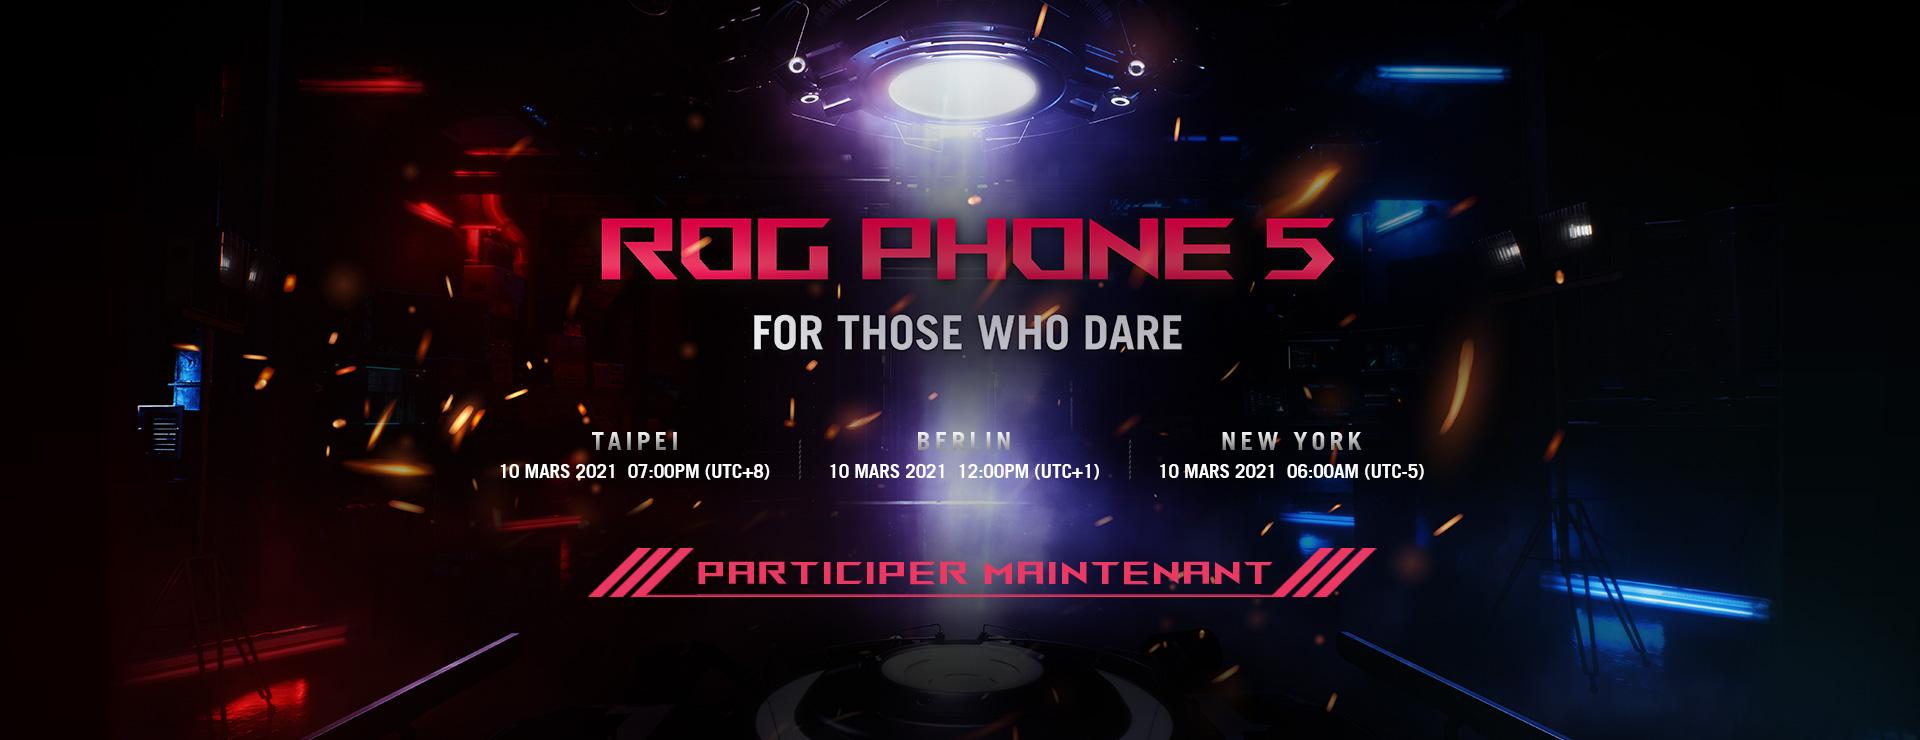 ROG Phone 5 Event